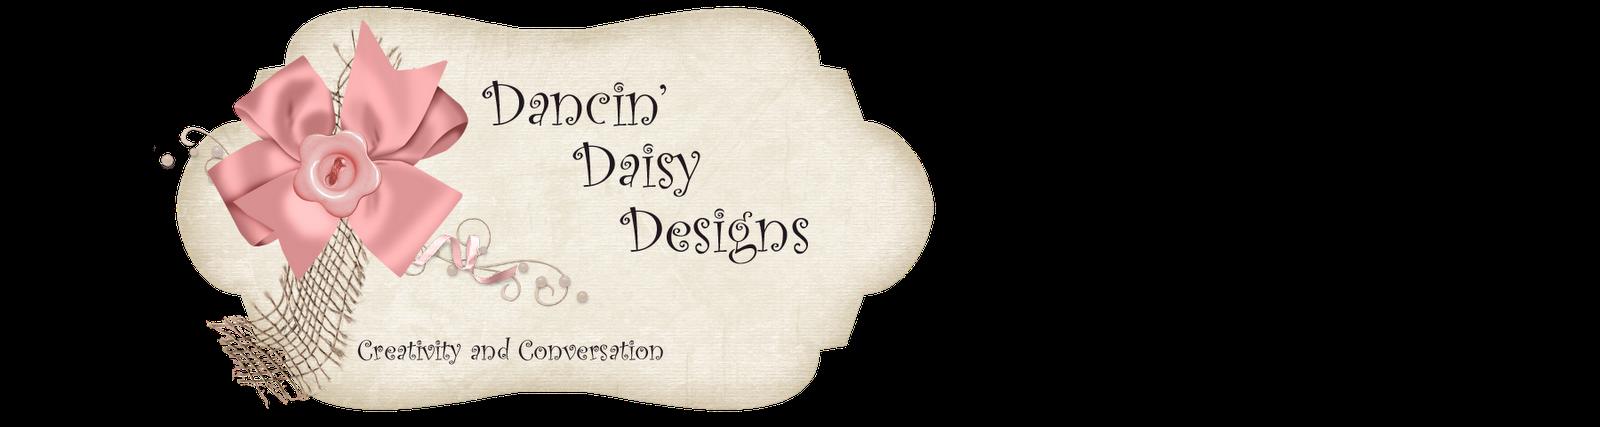 Dancin' Daisy Designs